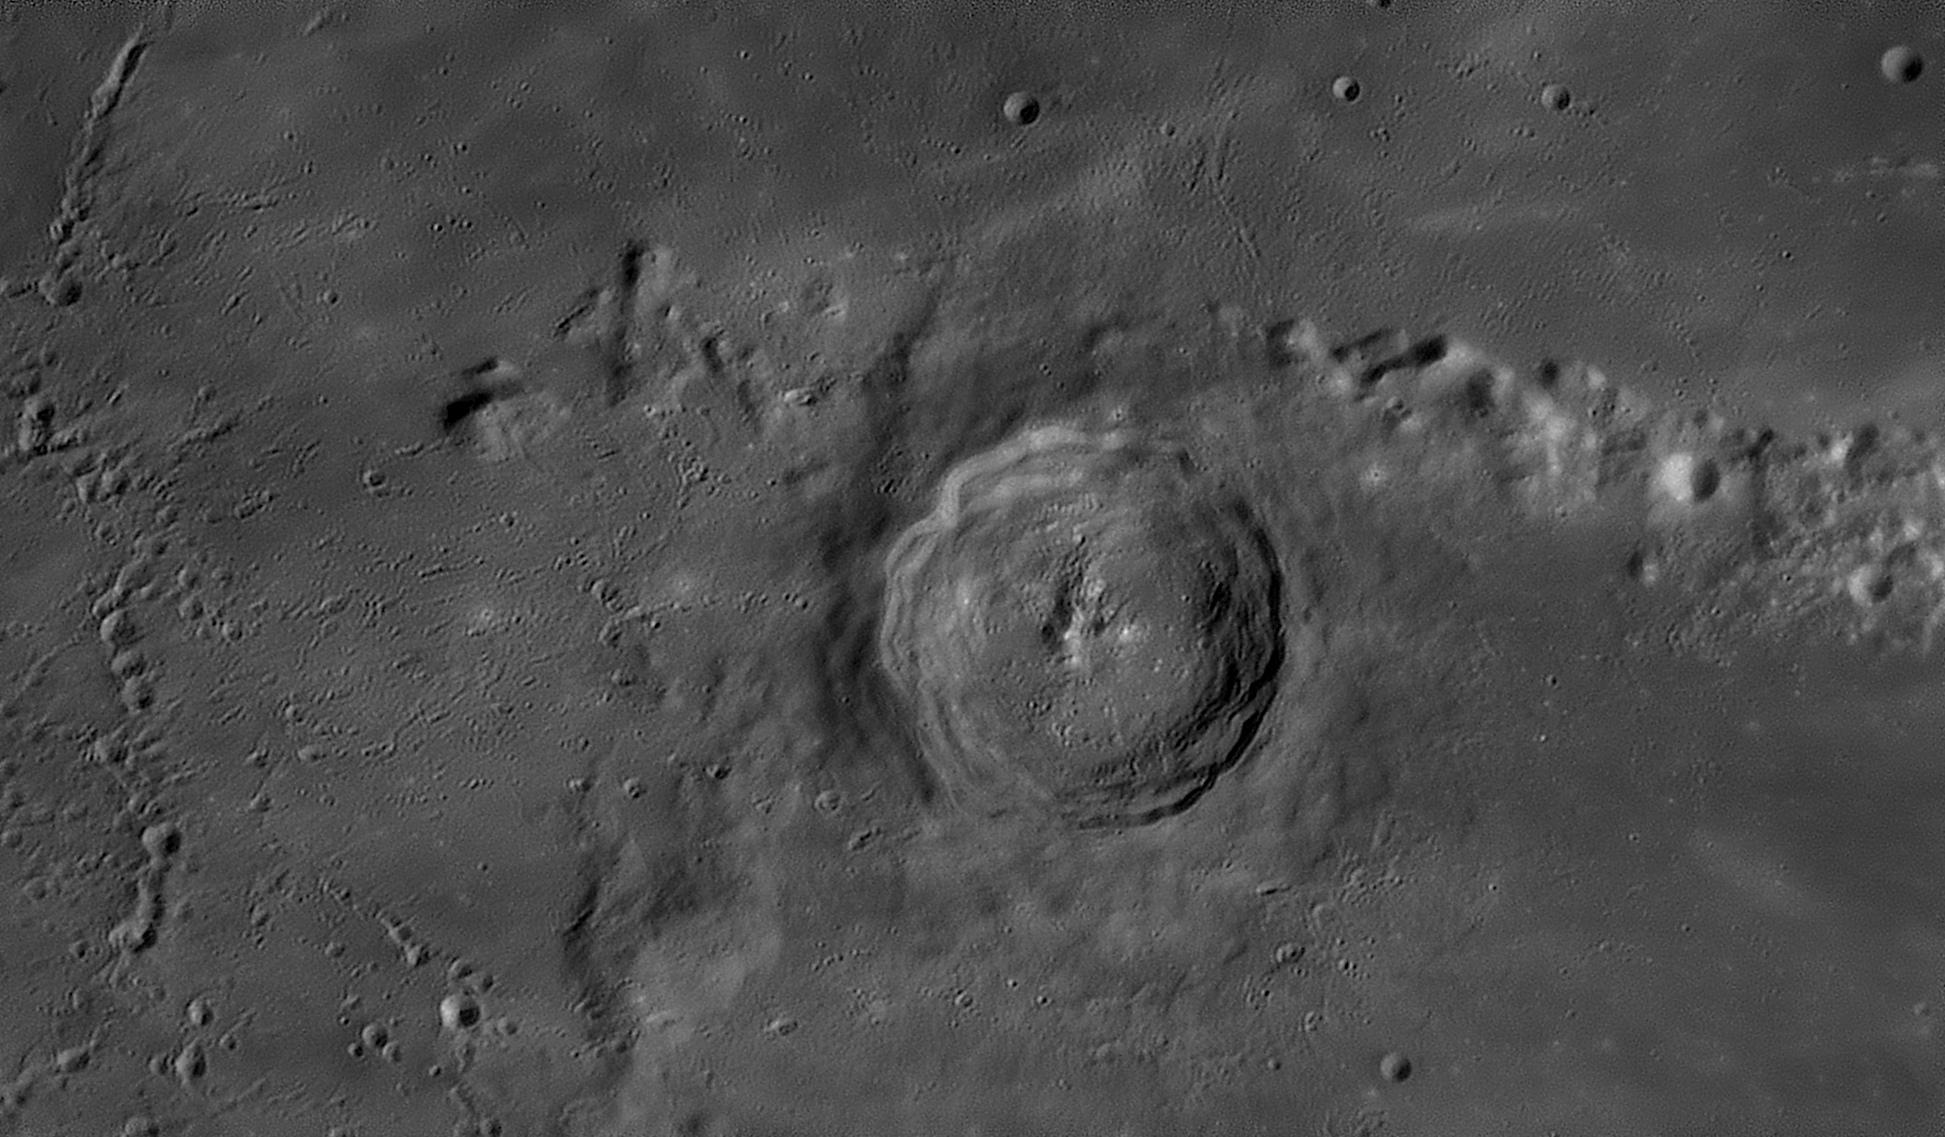 large.moon_03_04_2020_ERATOSTHENE.jpg.f9b129b88d7cb6721f74fb61632b1268.jpg